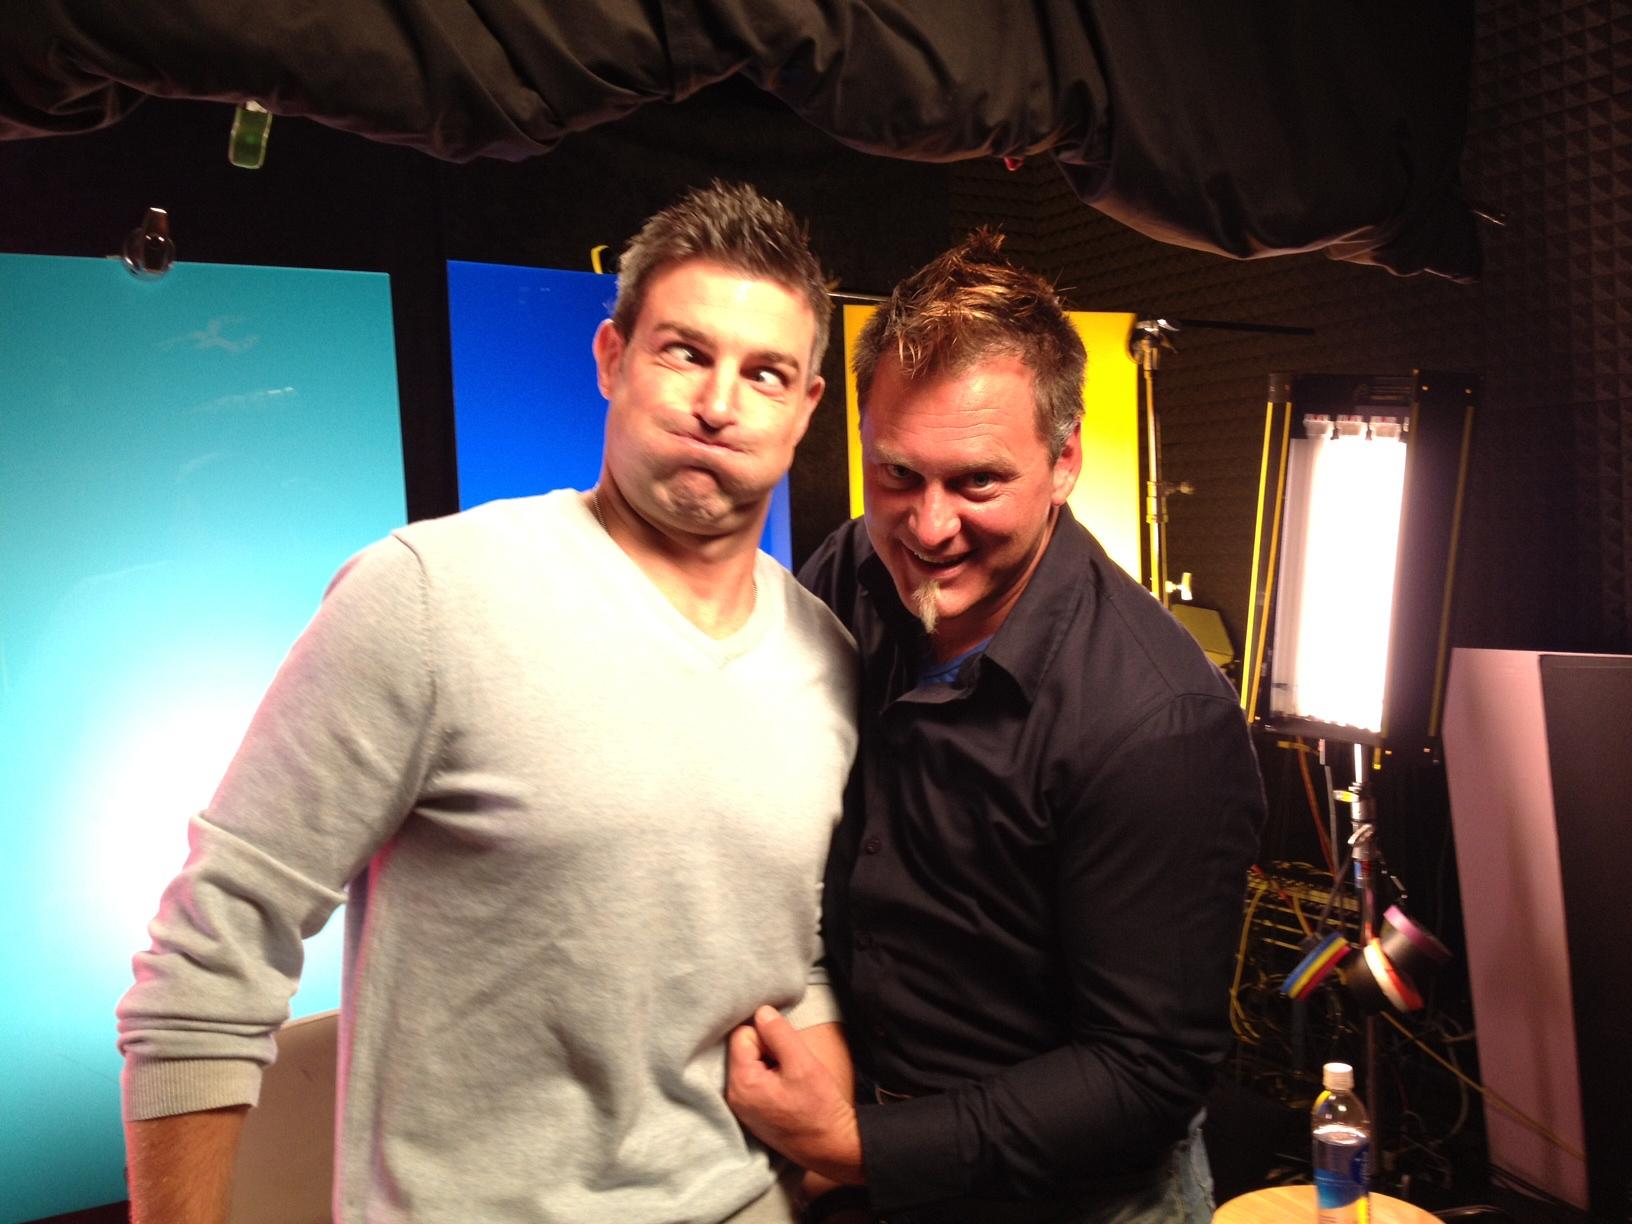 Jeff and Joe